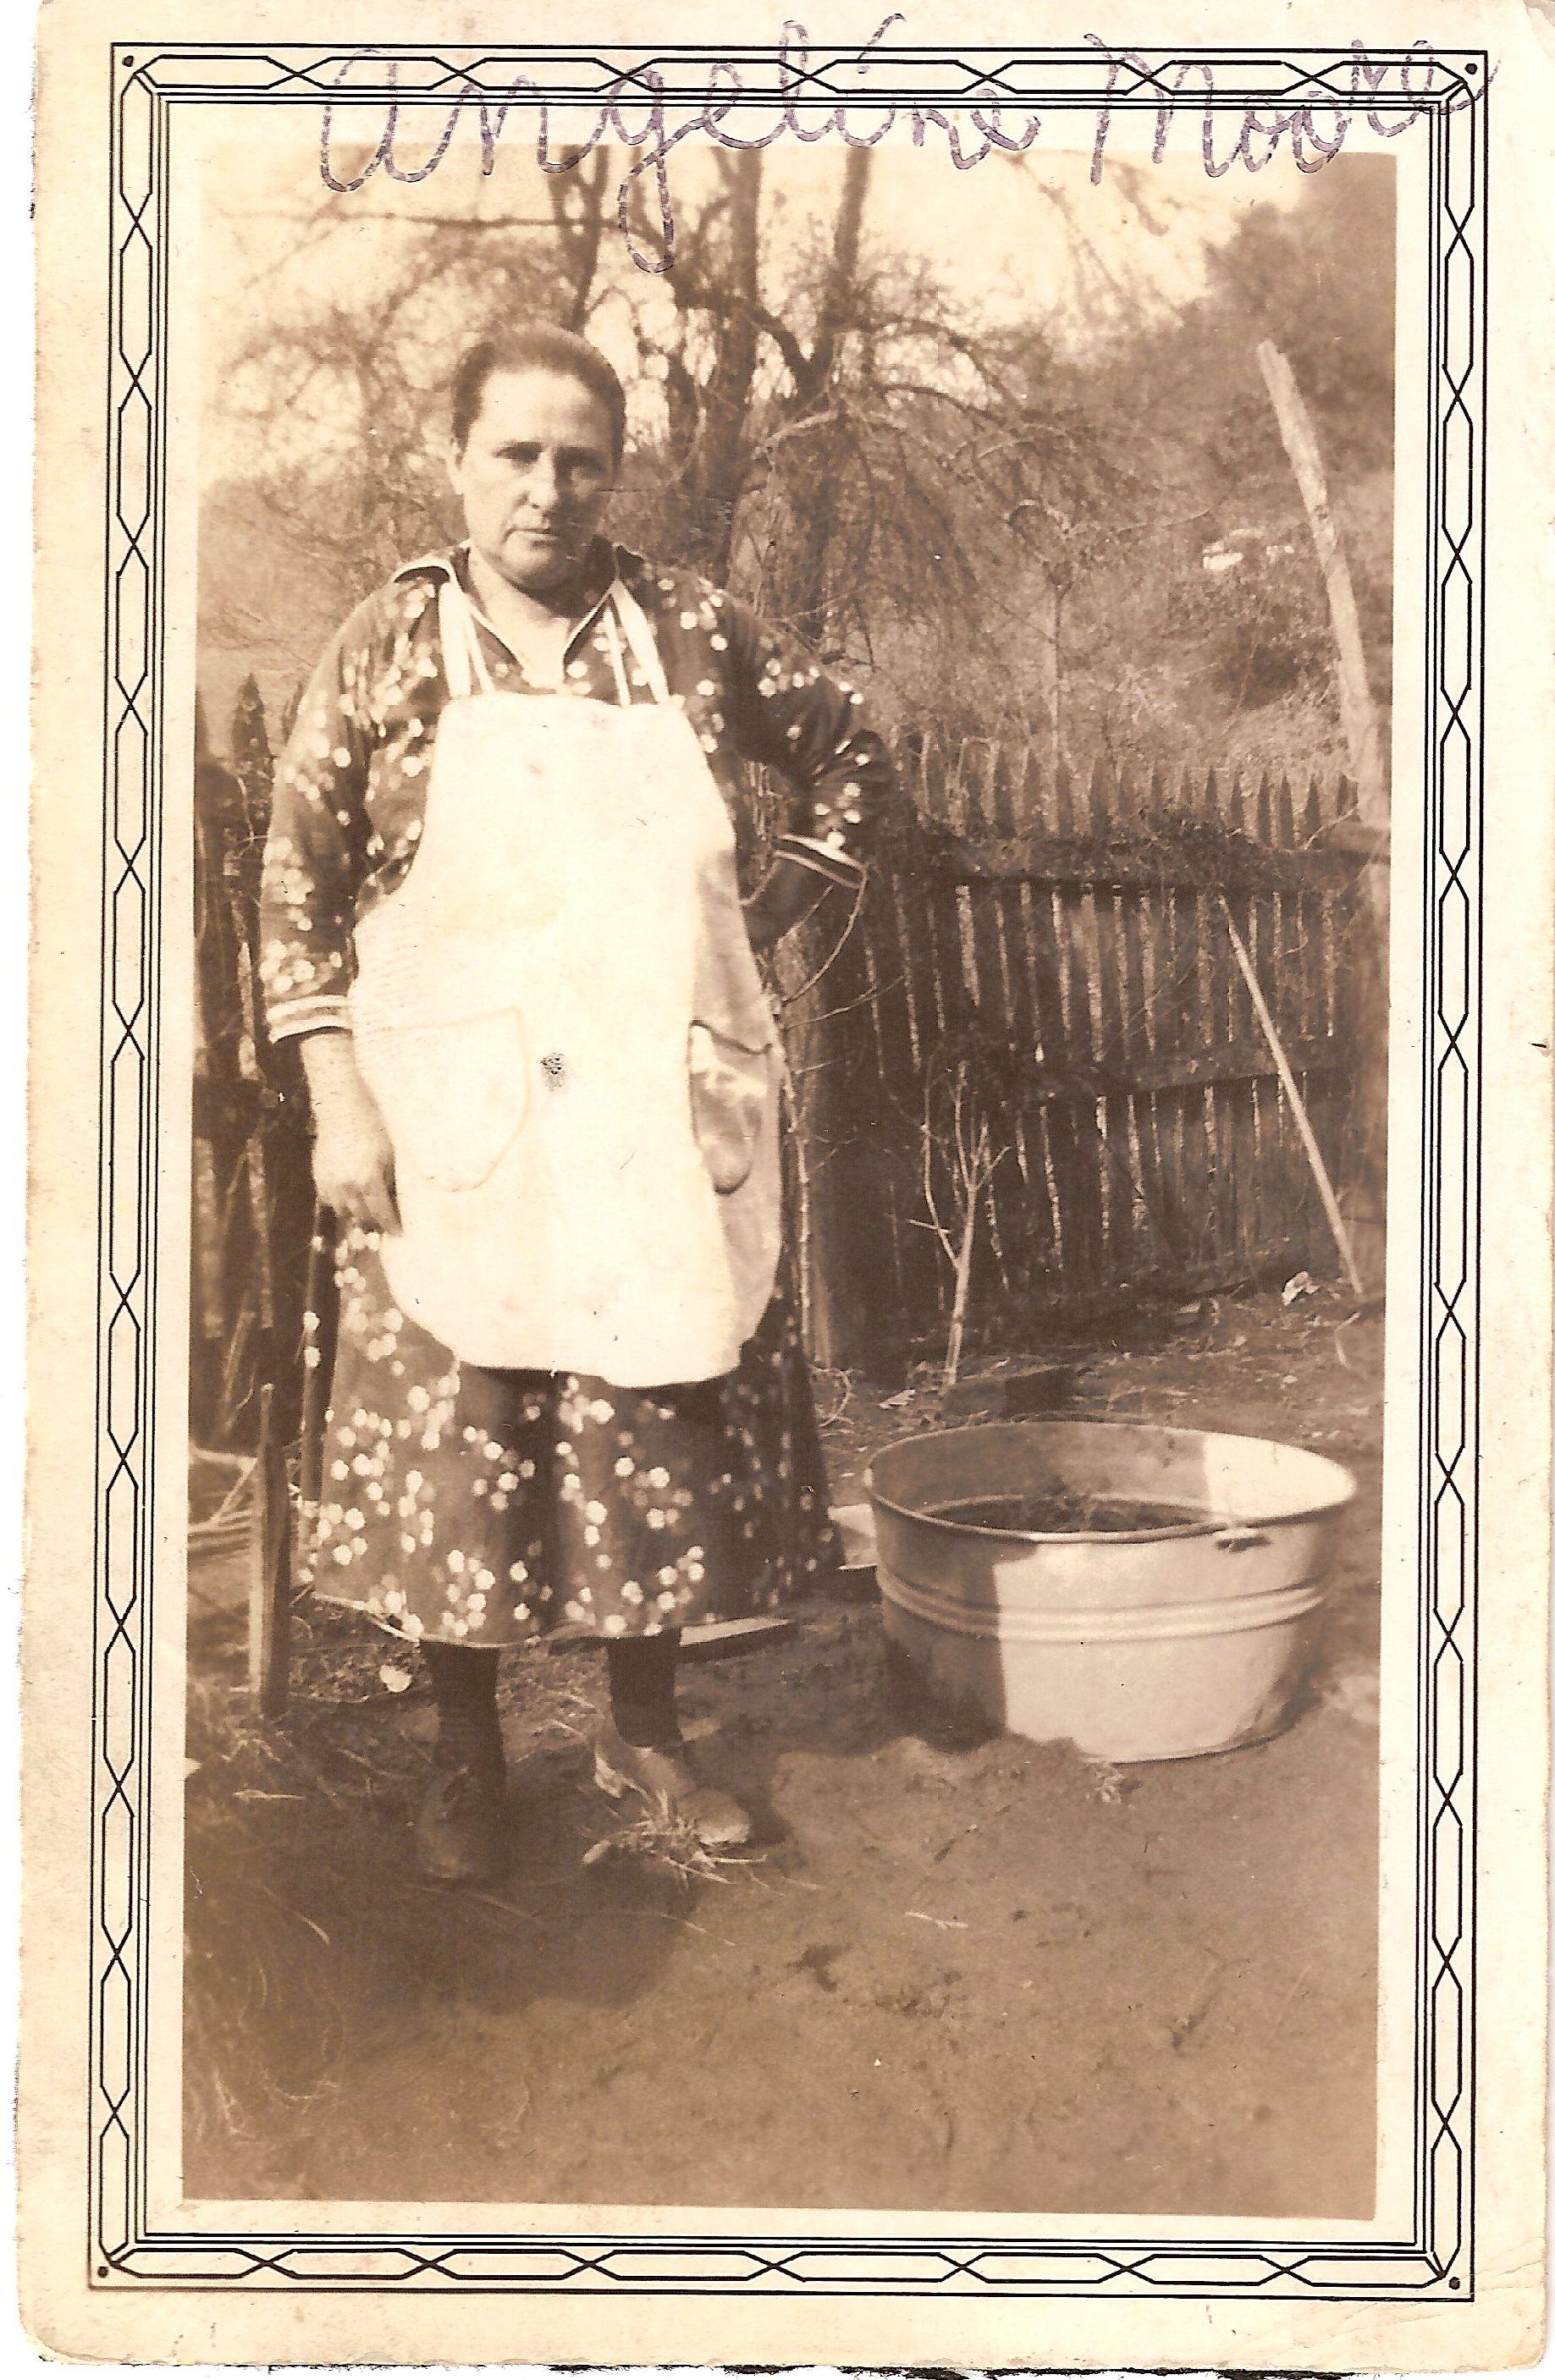 Angeline (Smith) Moore (1882-1946)